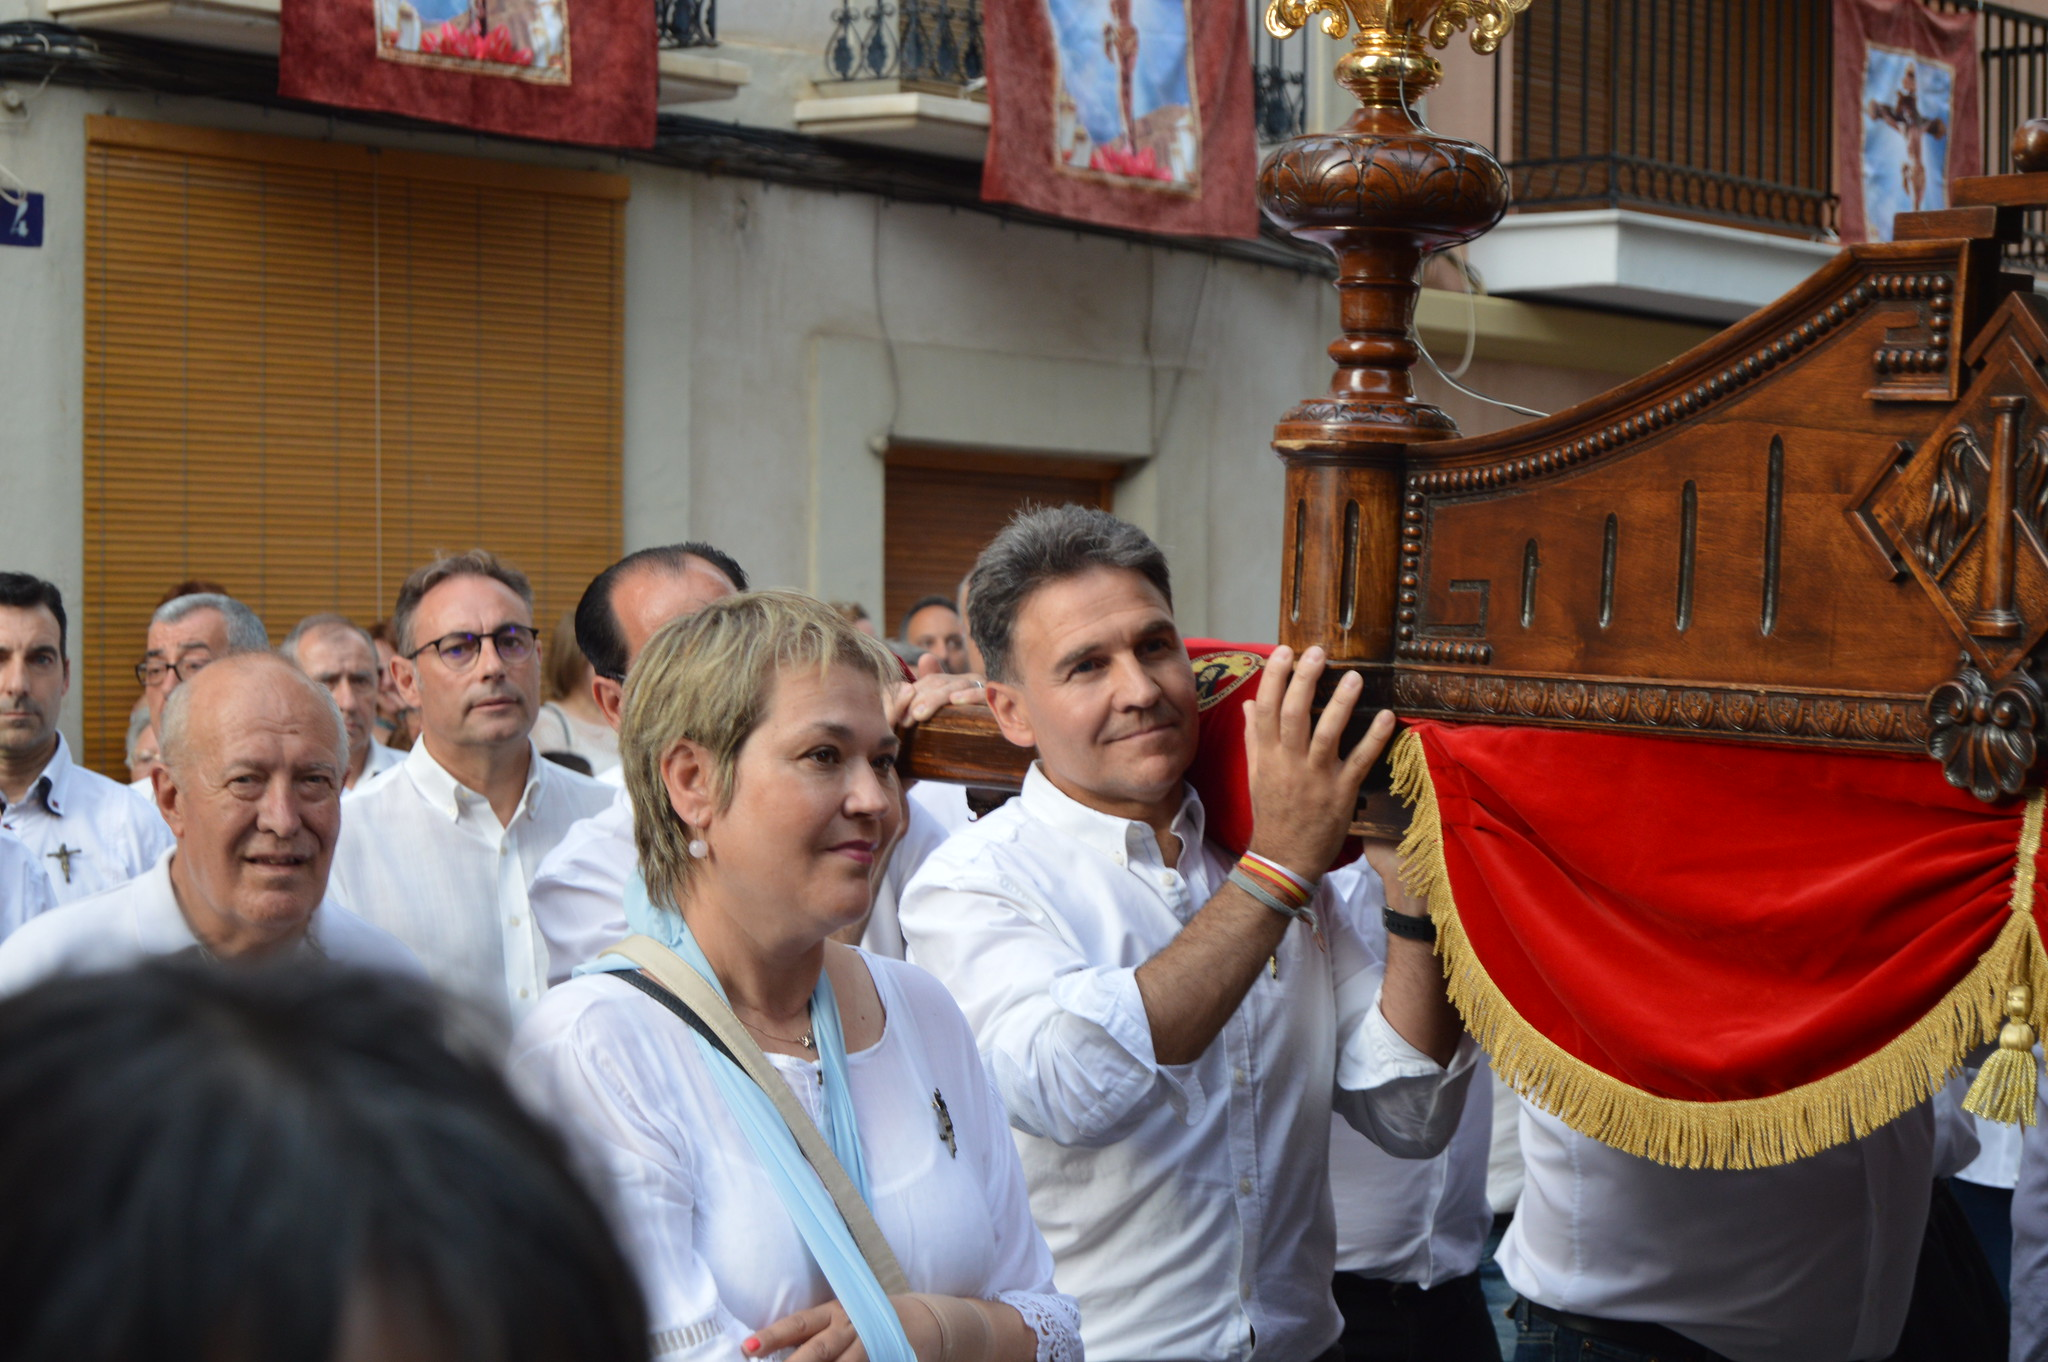 (2019-07-07) Procesión de subida - Adrián Romero Montesinos (07)